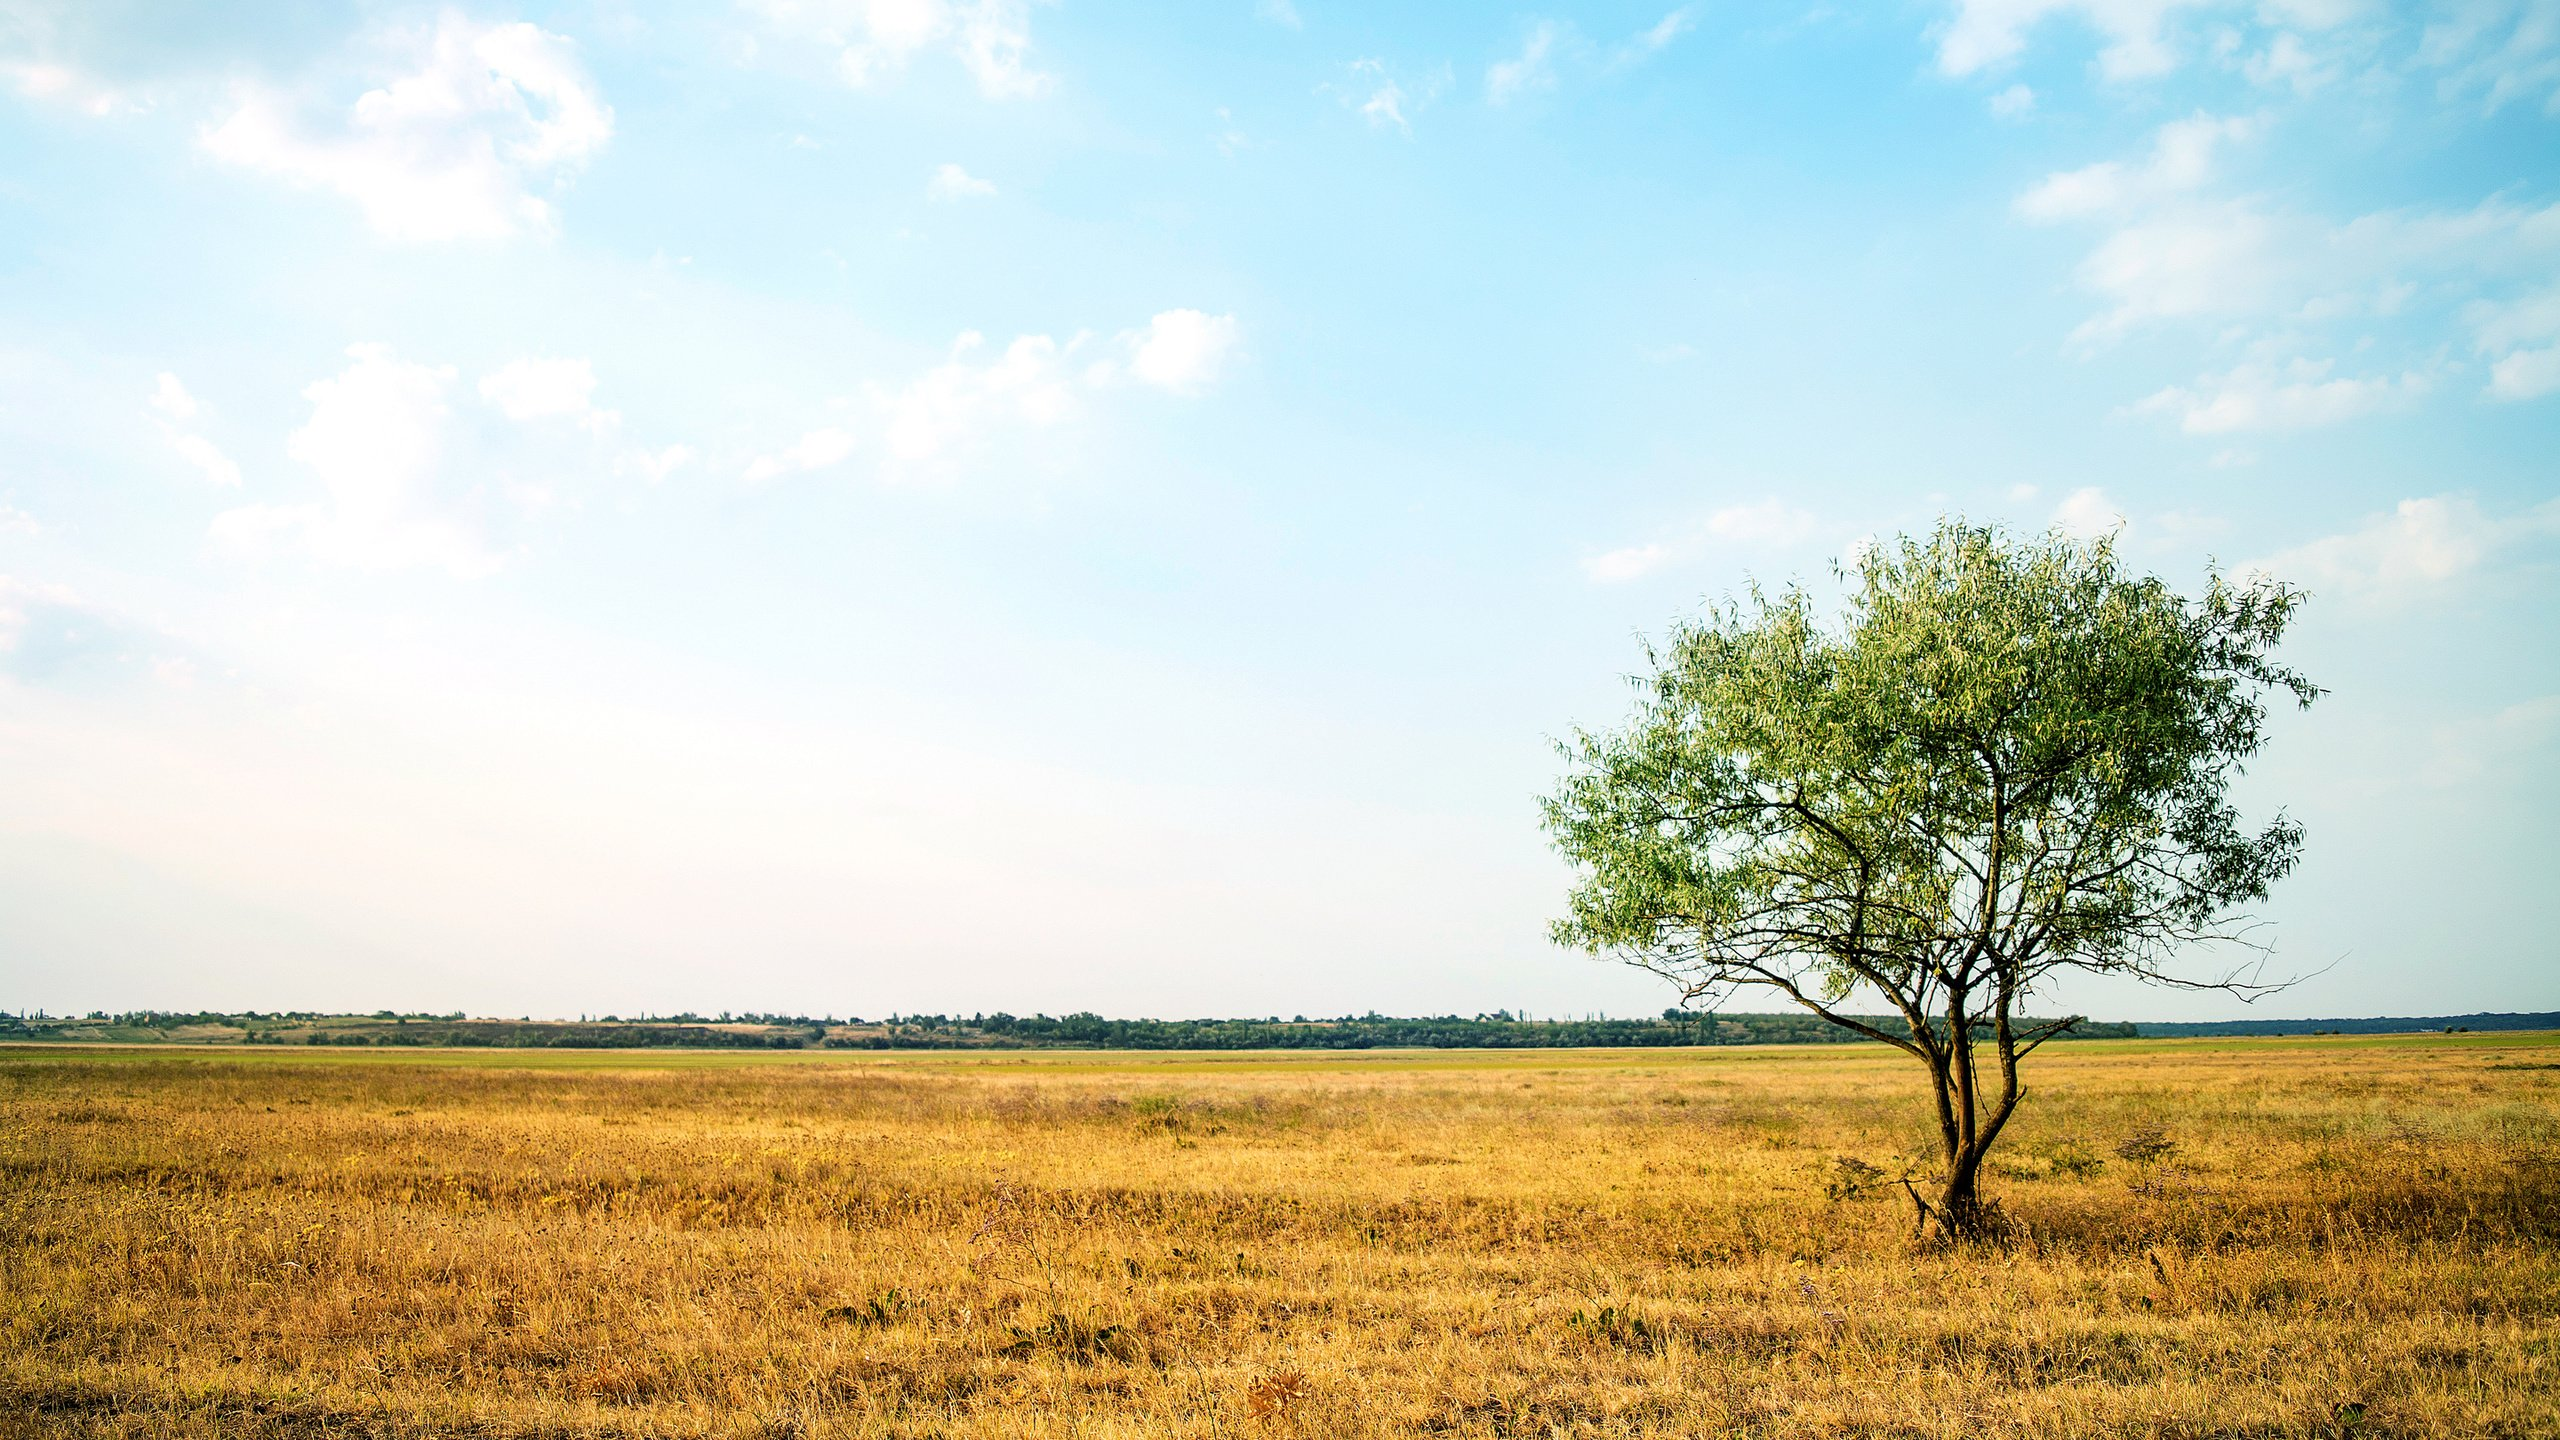 блондинка дерево поле blonde tree field  № 1377145 загрузить